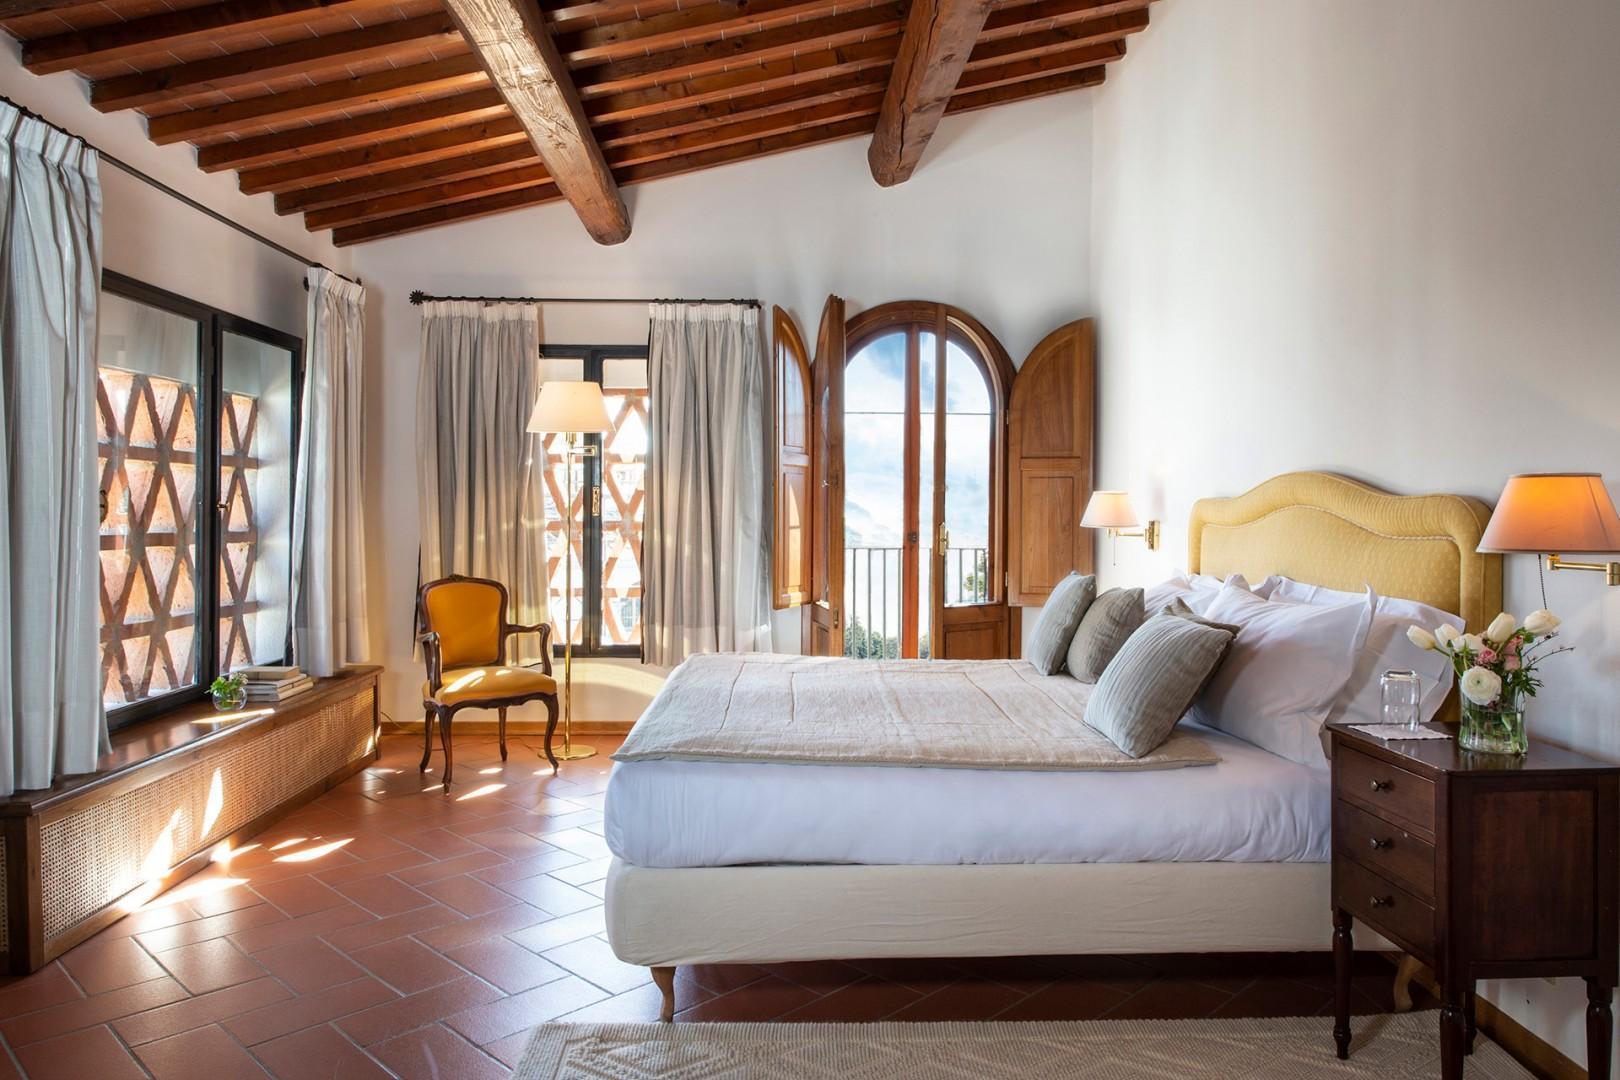 Cottage bedroom 2 also with en suite bathroom.